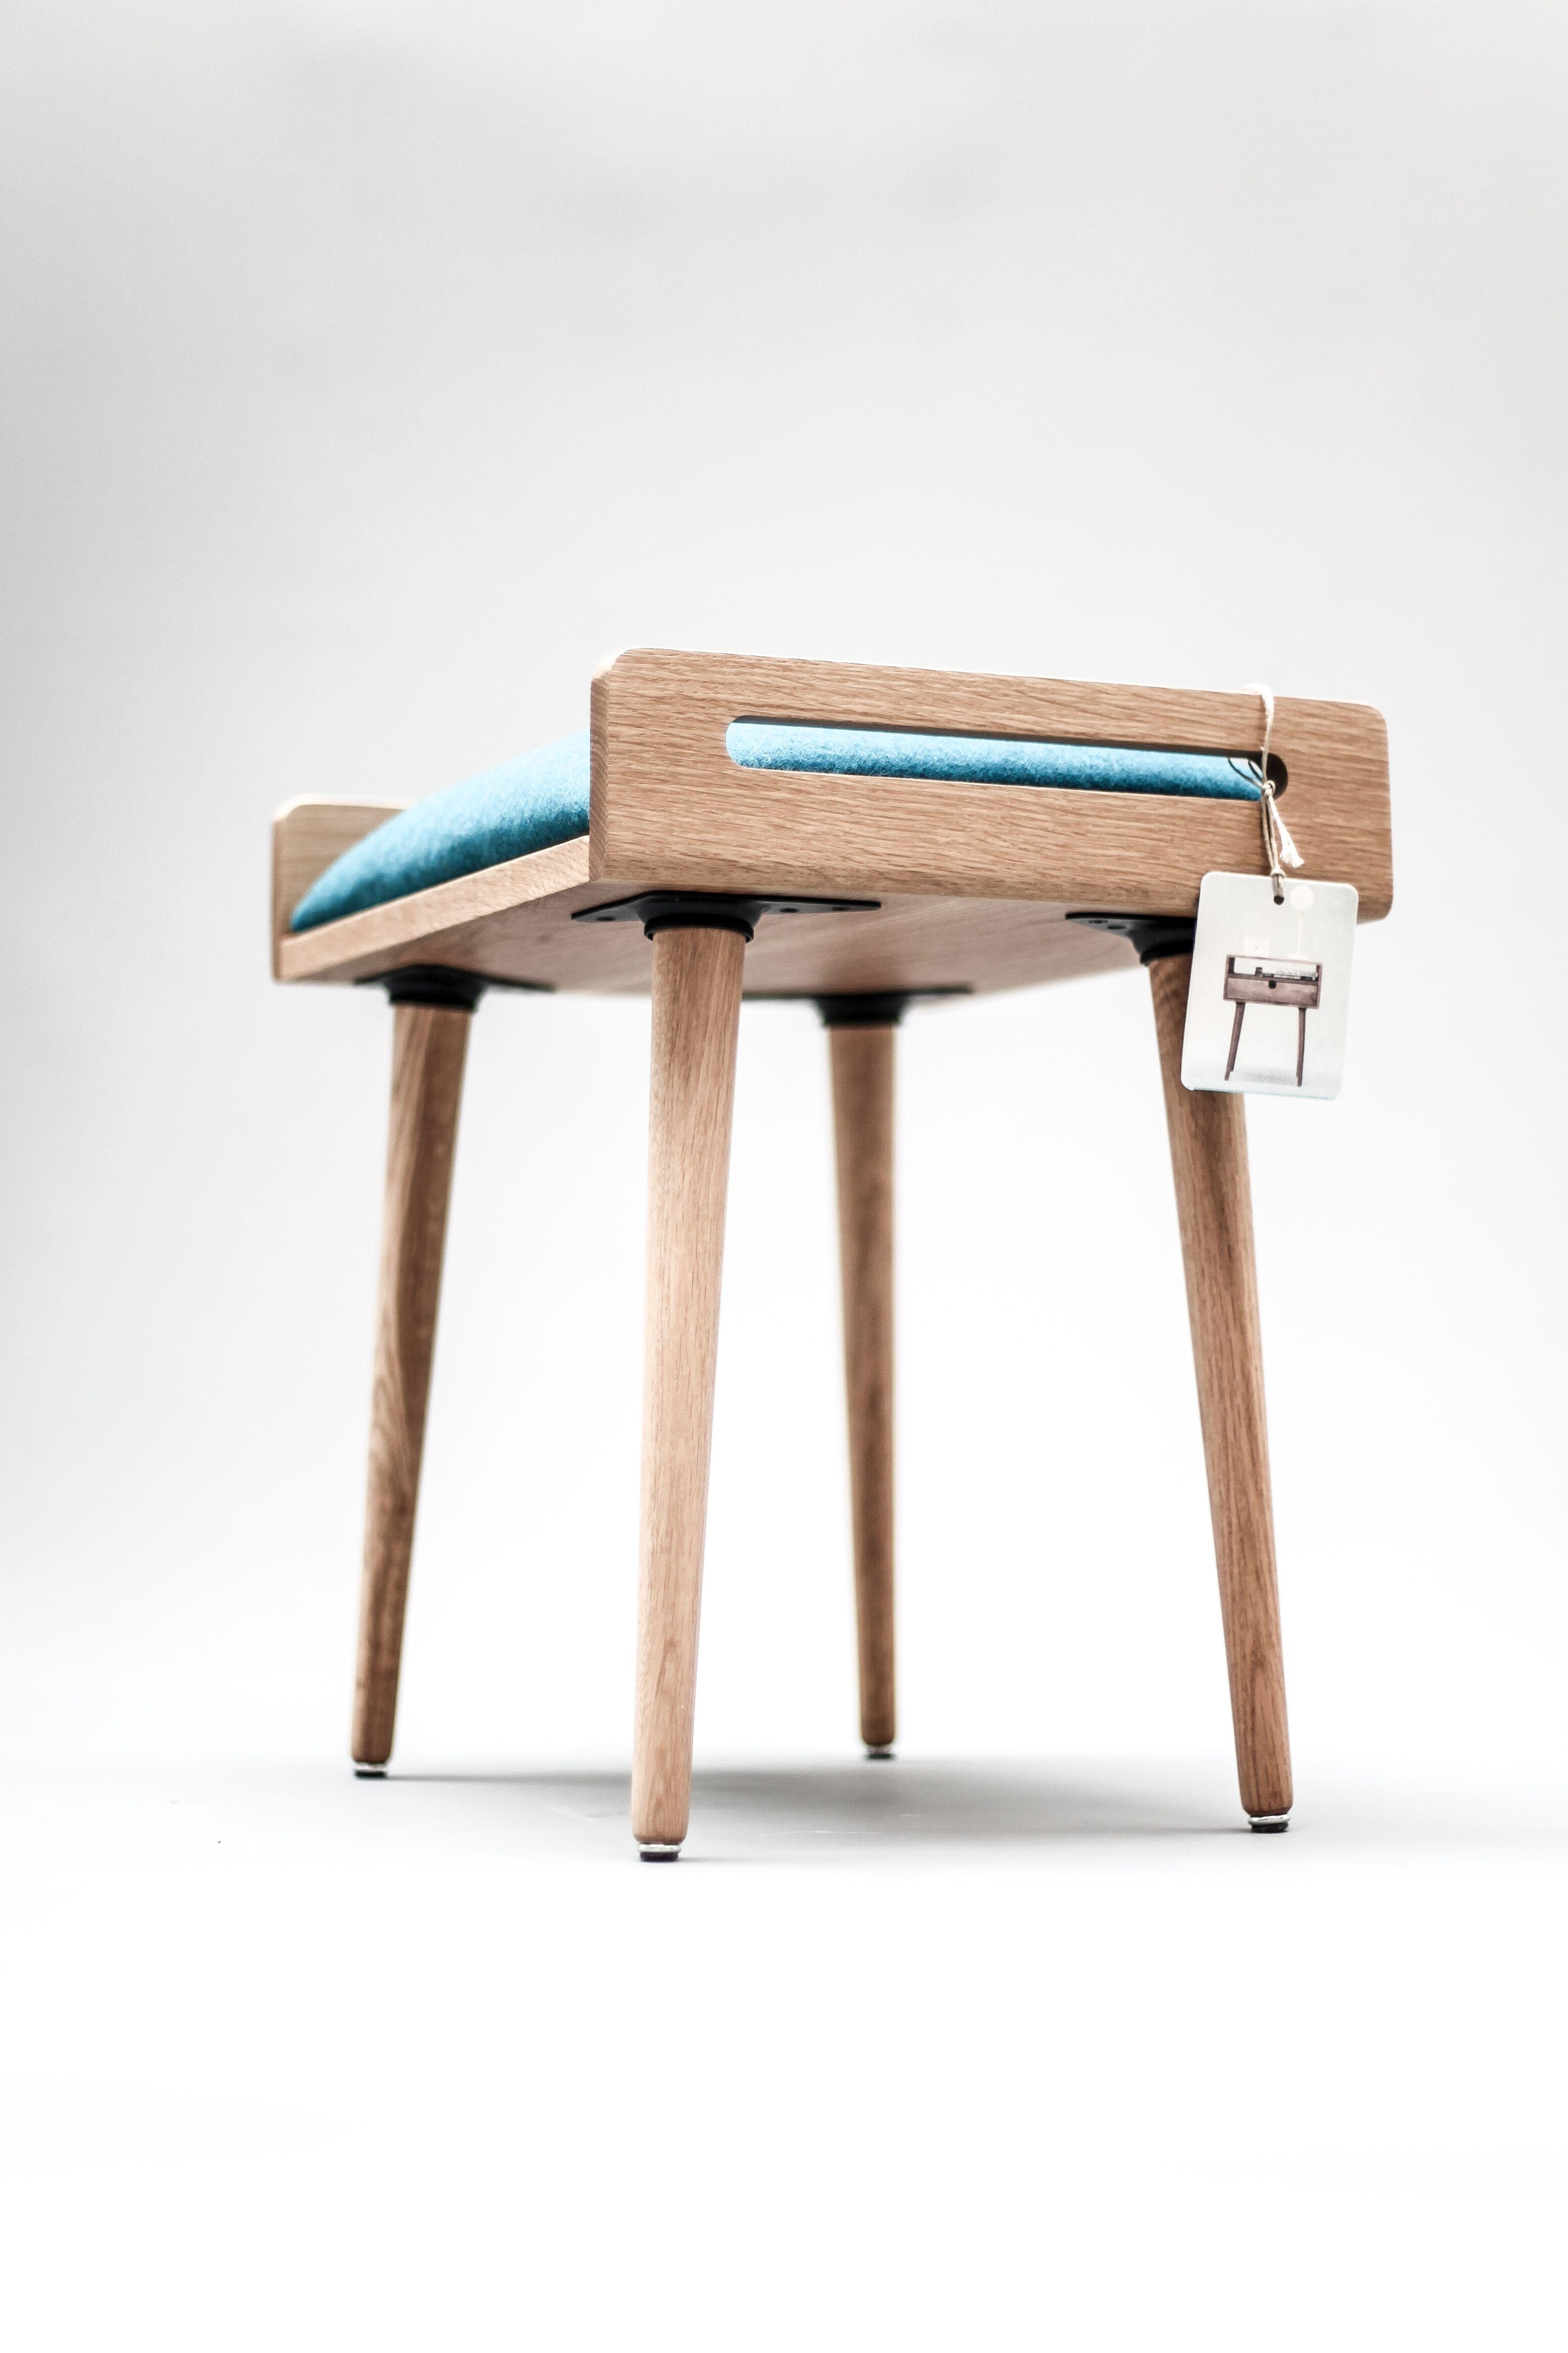 Oak Stool 2 0 On Behance Woodworks Pinterest Stools And Woodwork # Muebles Zertuche